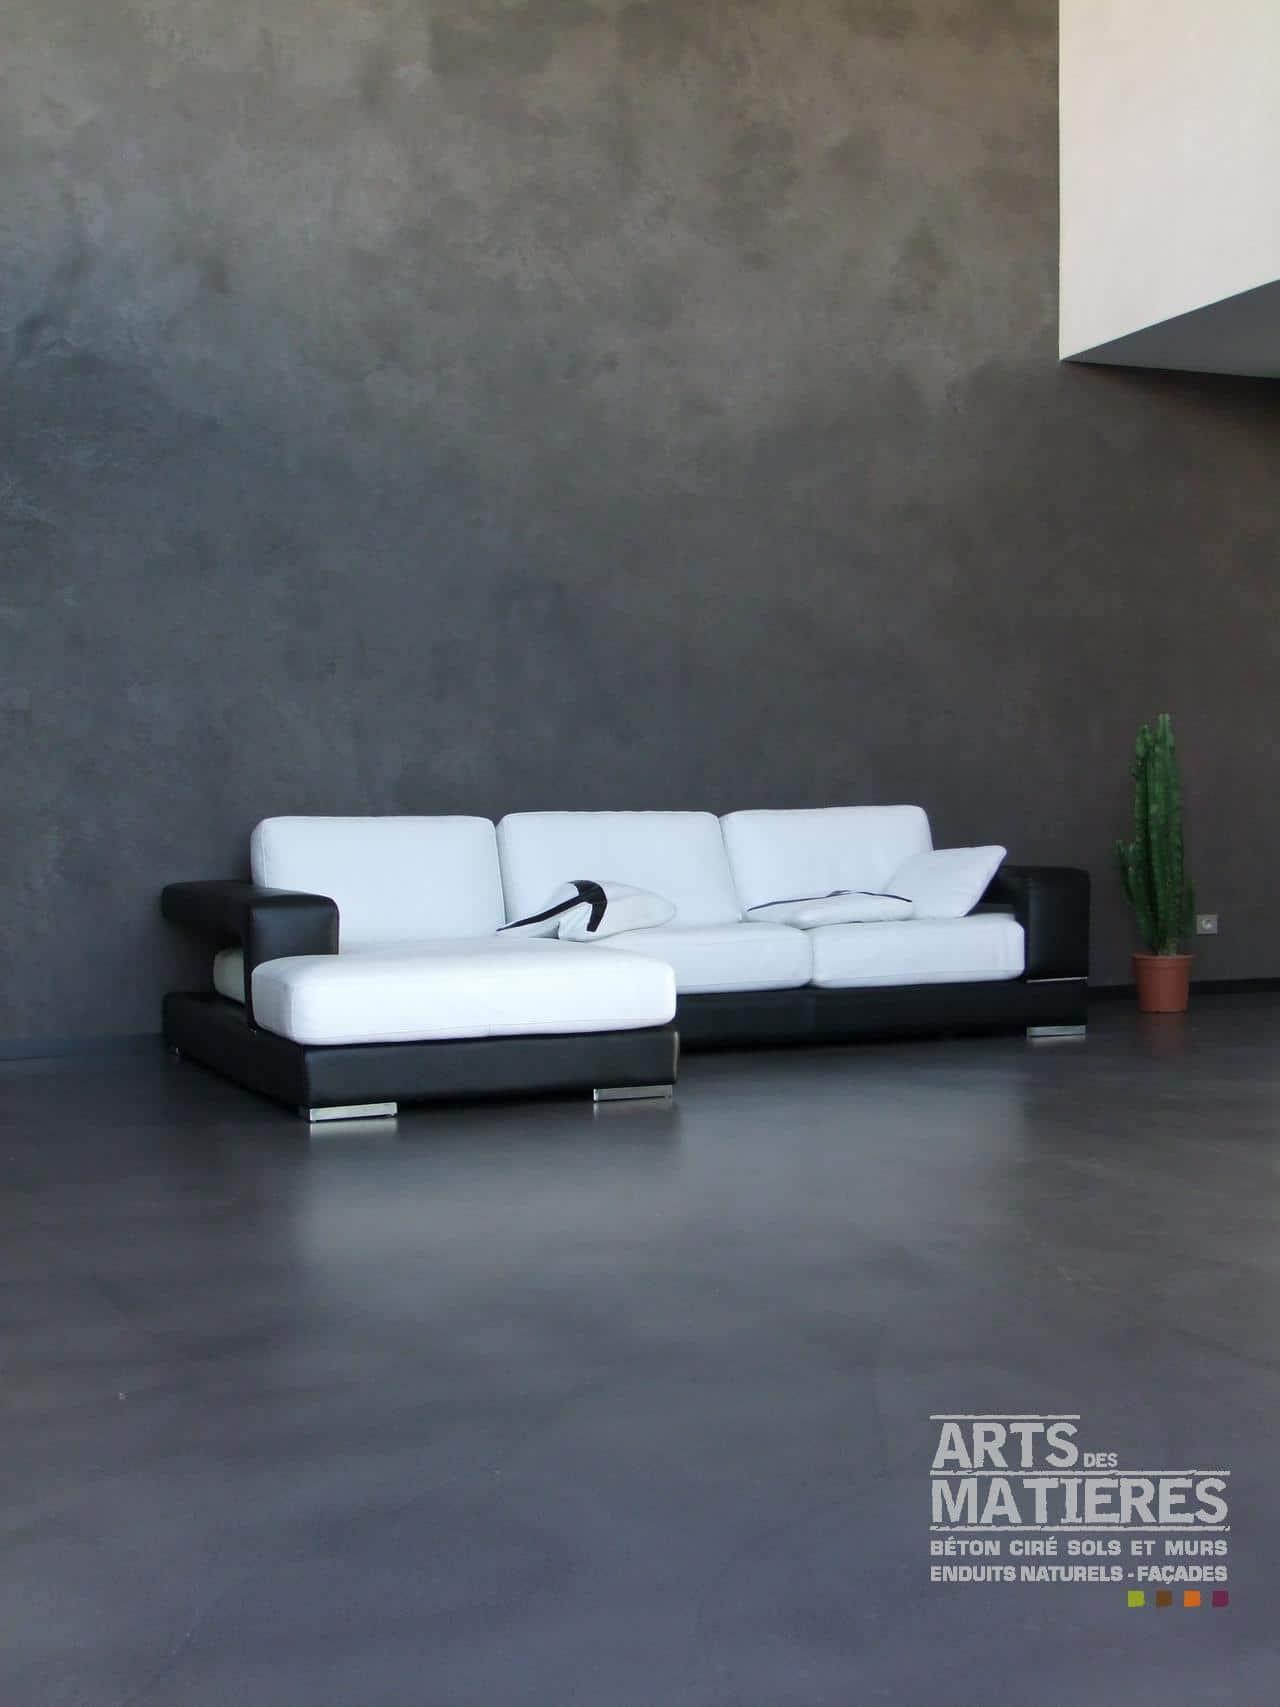 effet b ton brut ou effet pierre b ton cir enduits d coratifs naturels by arts des mati res. Black Bedroom Furniture Sets. Home Design Ideas